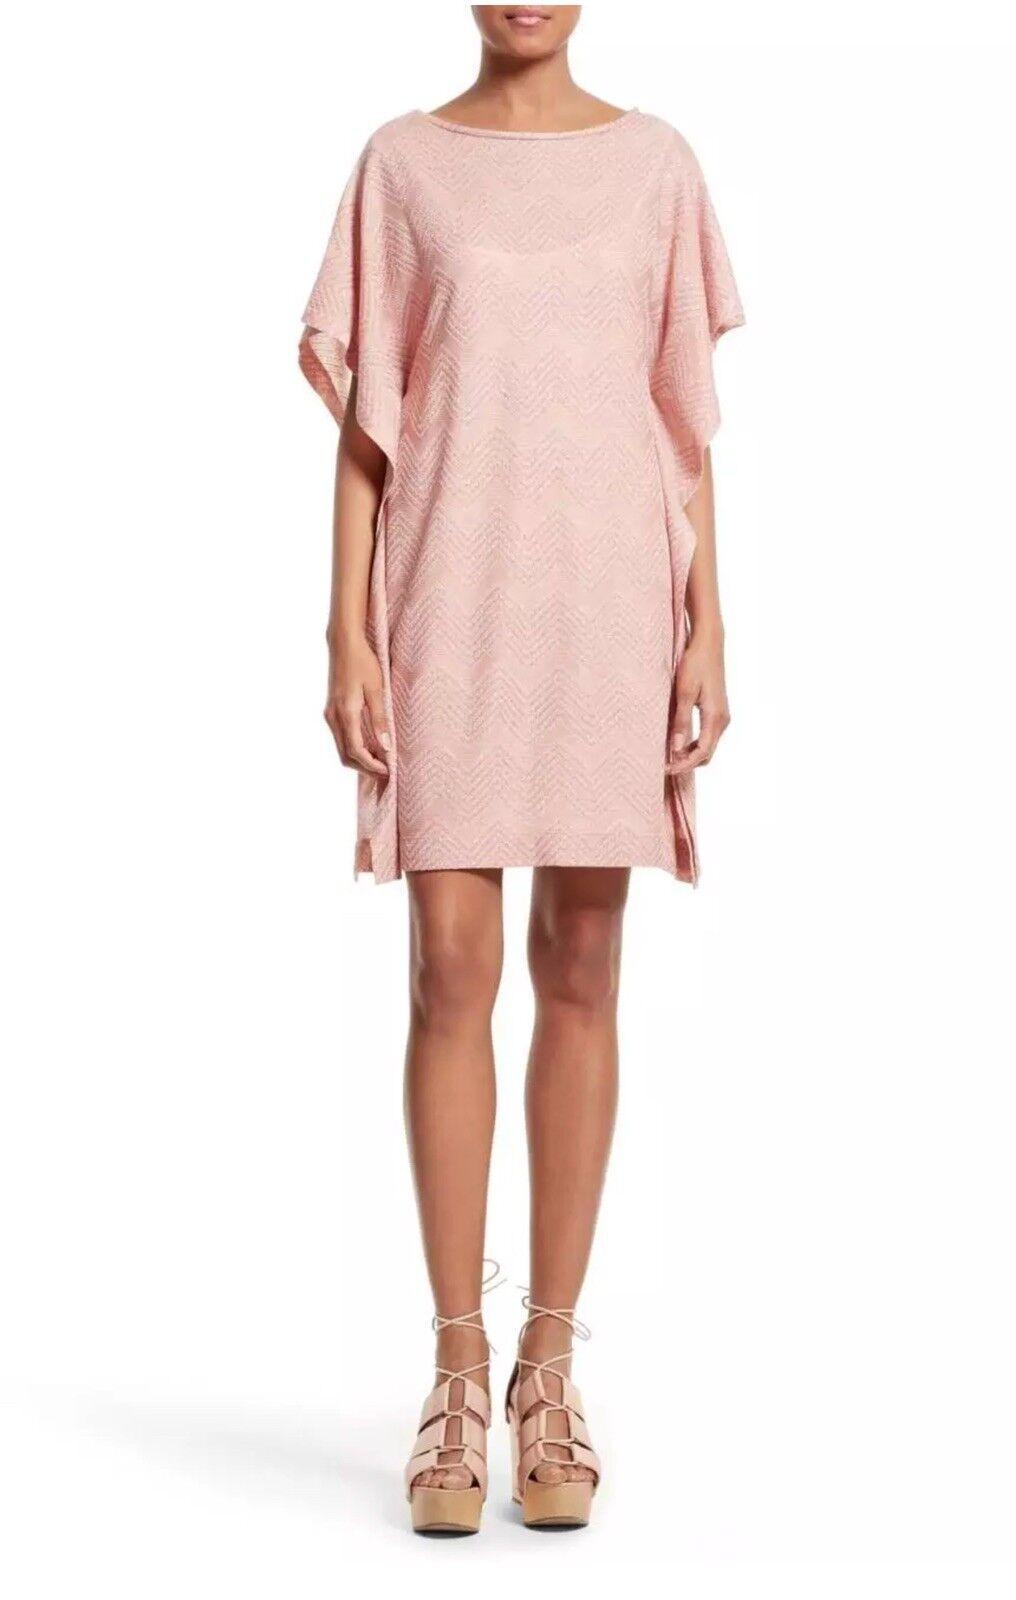 Missoni Dress NWT Small Retail  595